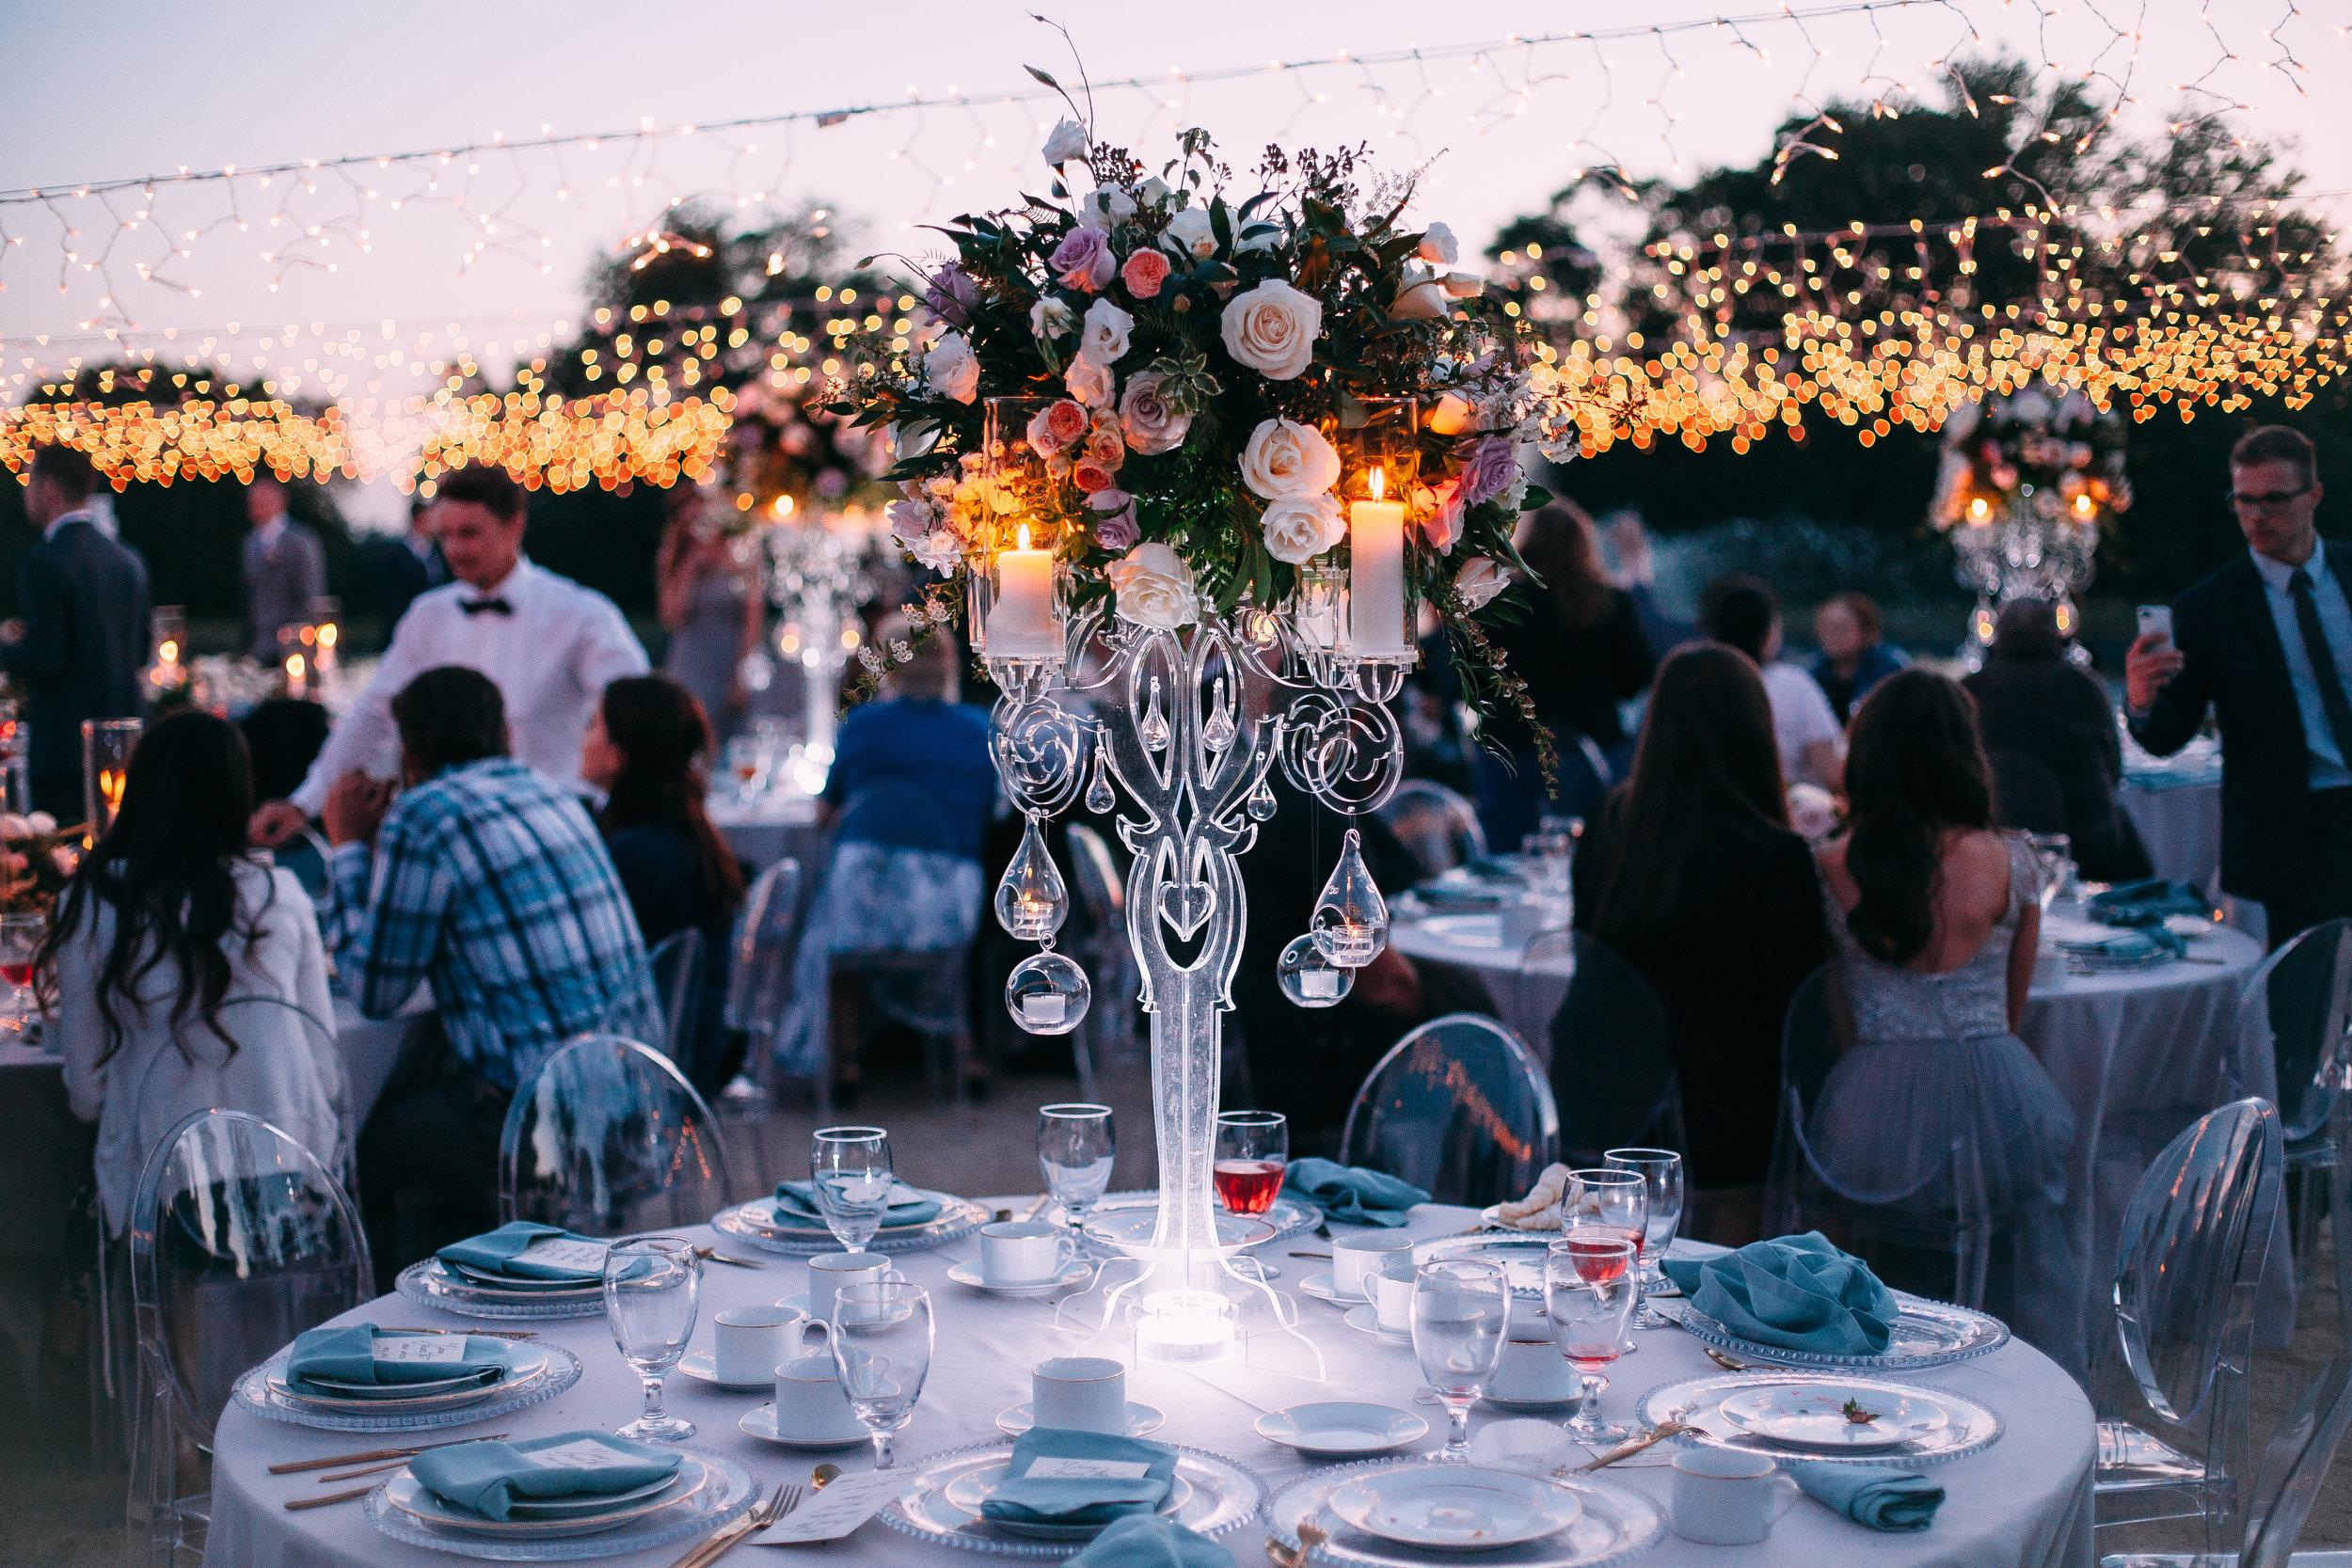 Violette-fleurs-event-design-roseville-anna-perevertaylo-rancho-robles-vinyards-Detail-Elegant-Blush-Installations.jpg